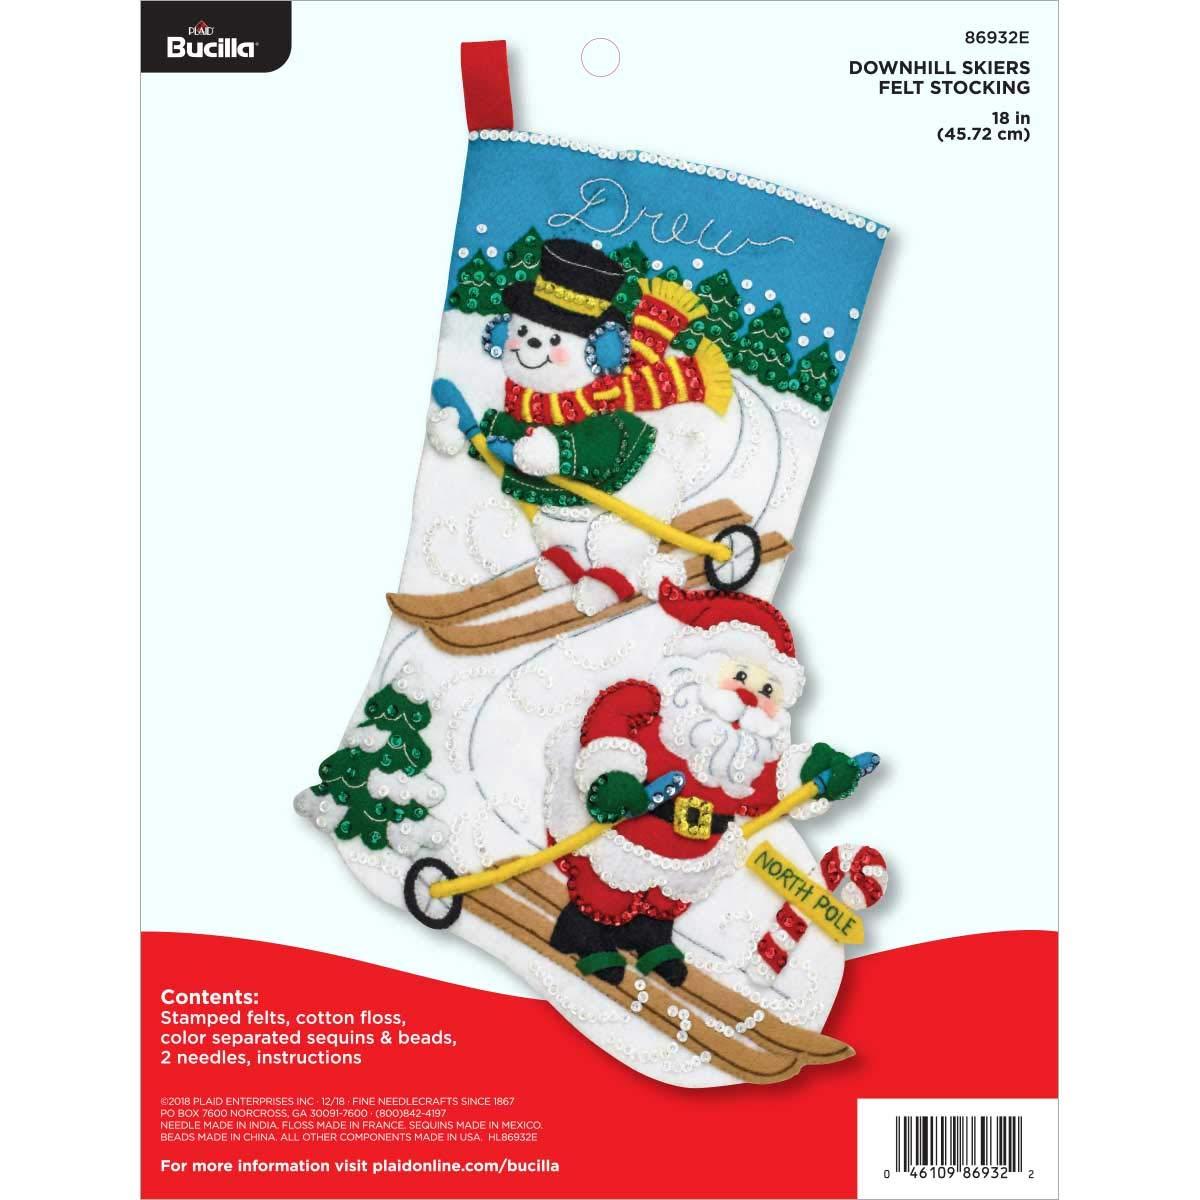 "Bucilla Felt Stocking Applique Kit, 18"", Downhill Skiers"